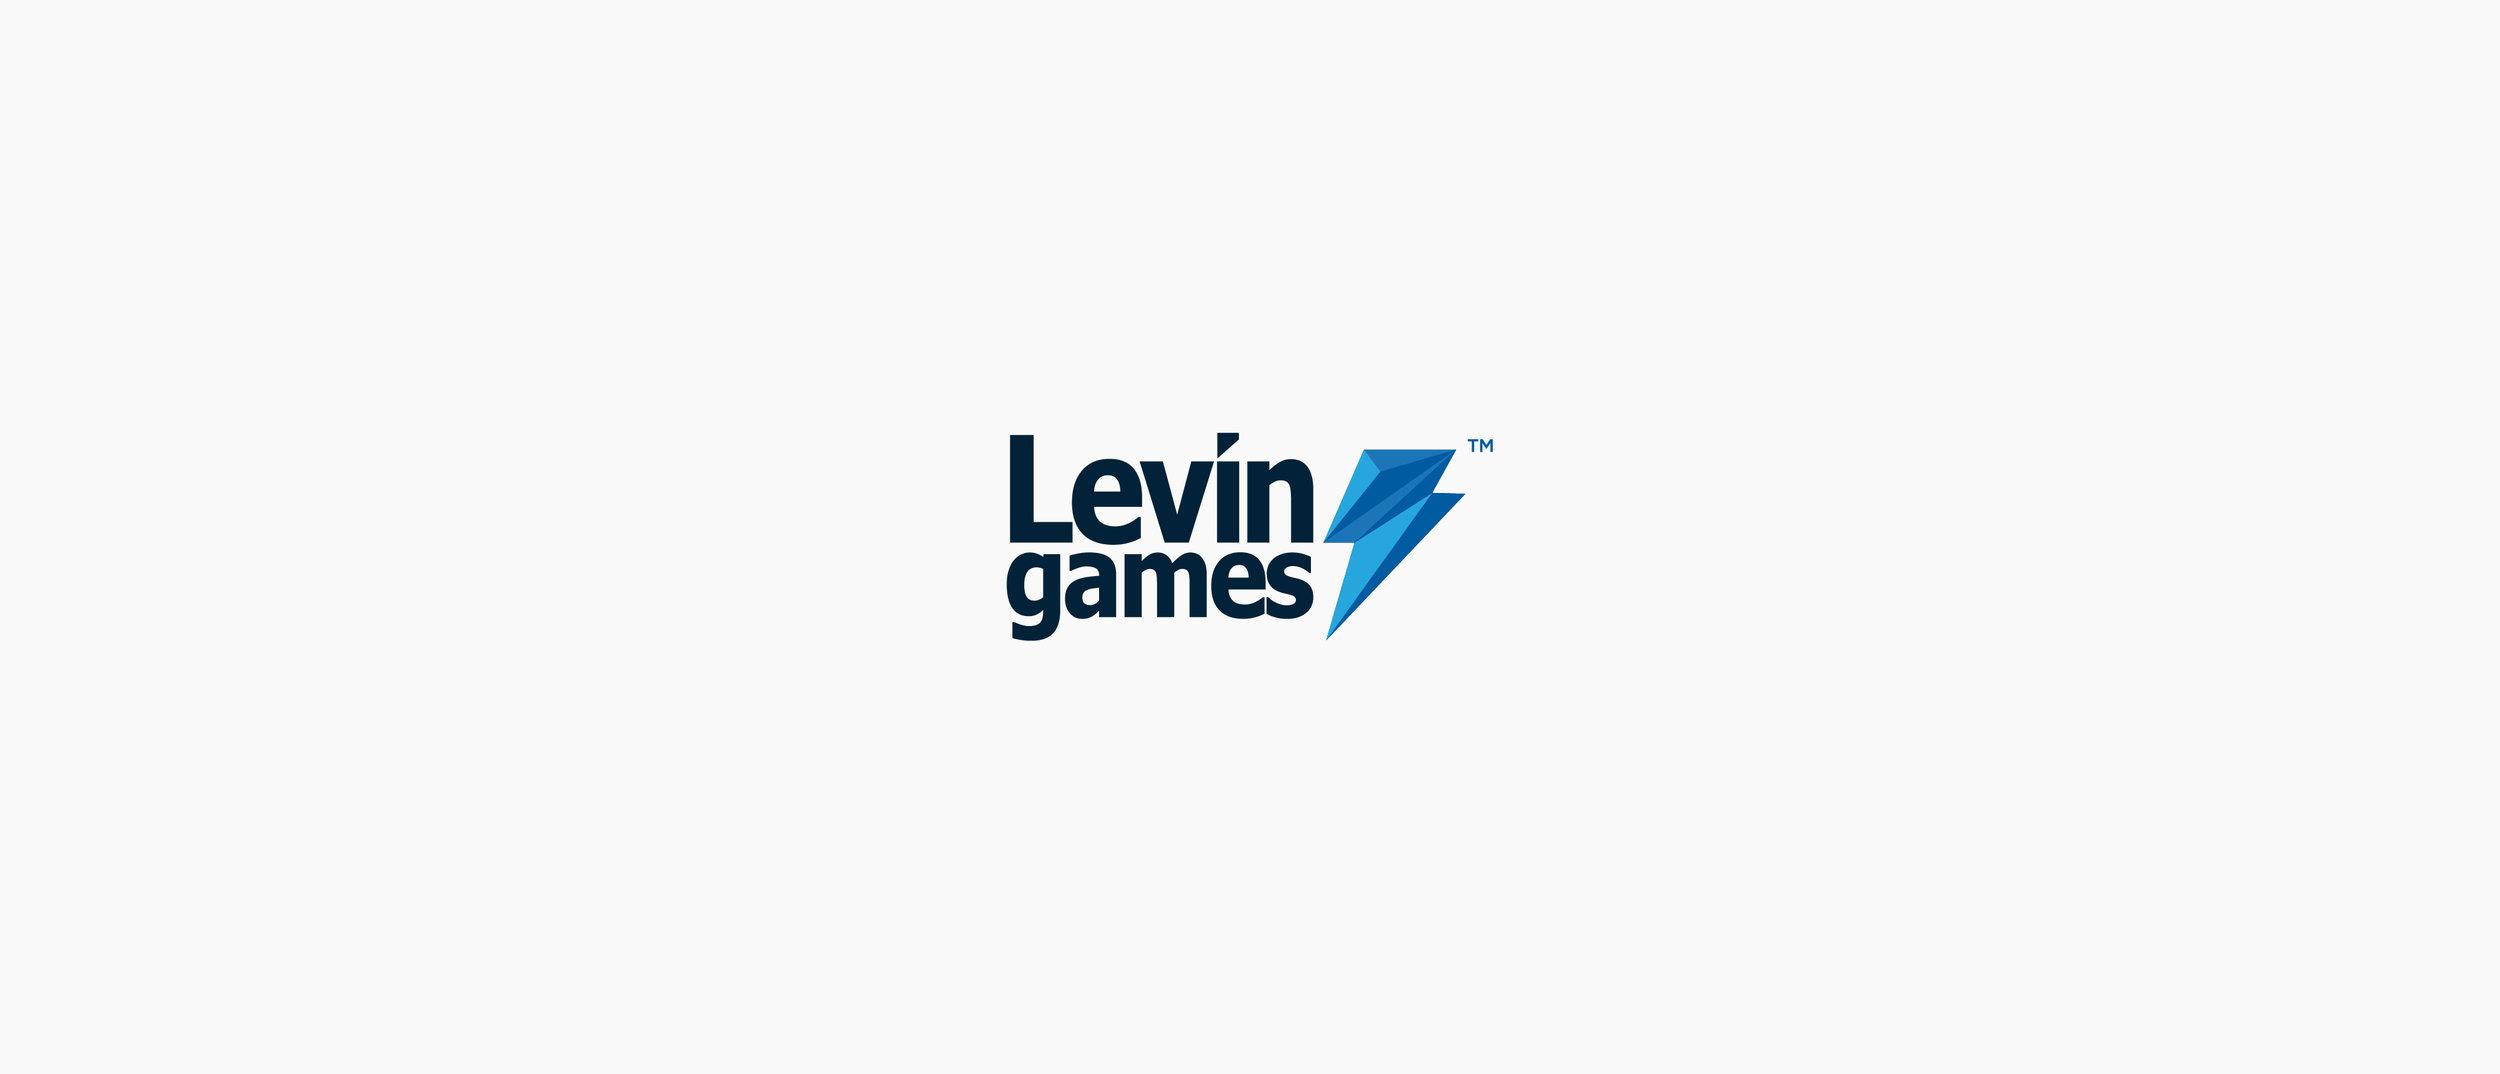 Levin Games | Game Development Company | 2017